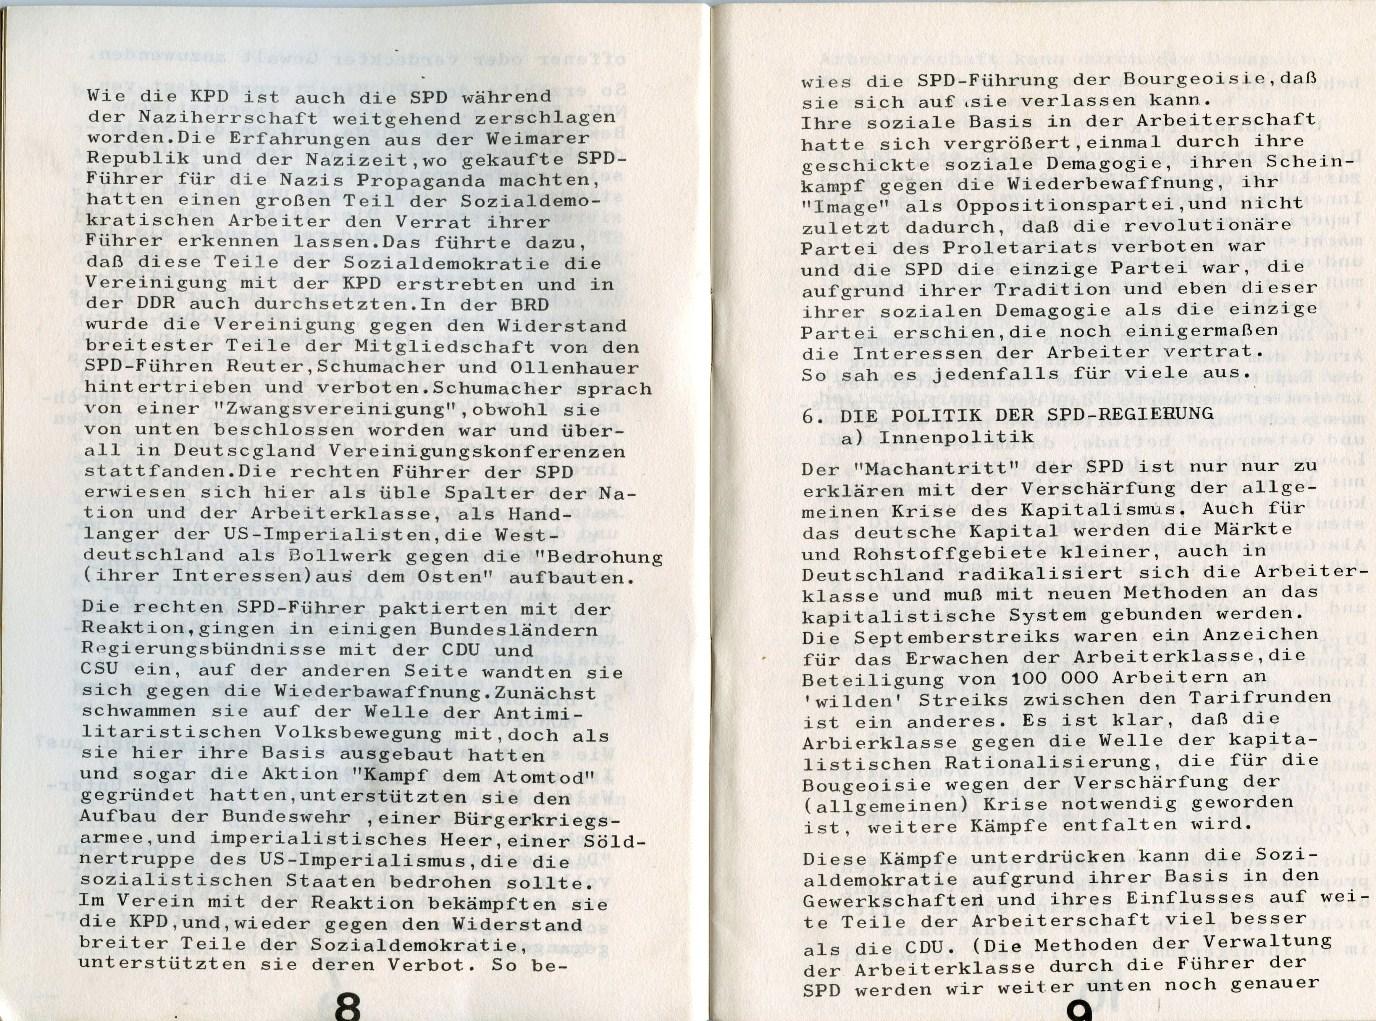 KJVD_Sozialdemokratie_Sozialfaschismus_1971_06